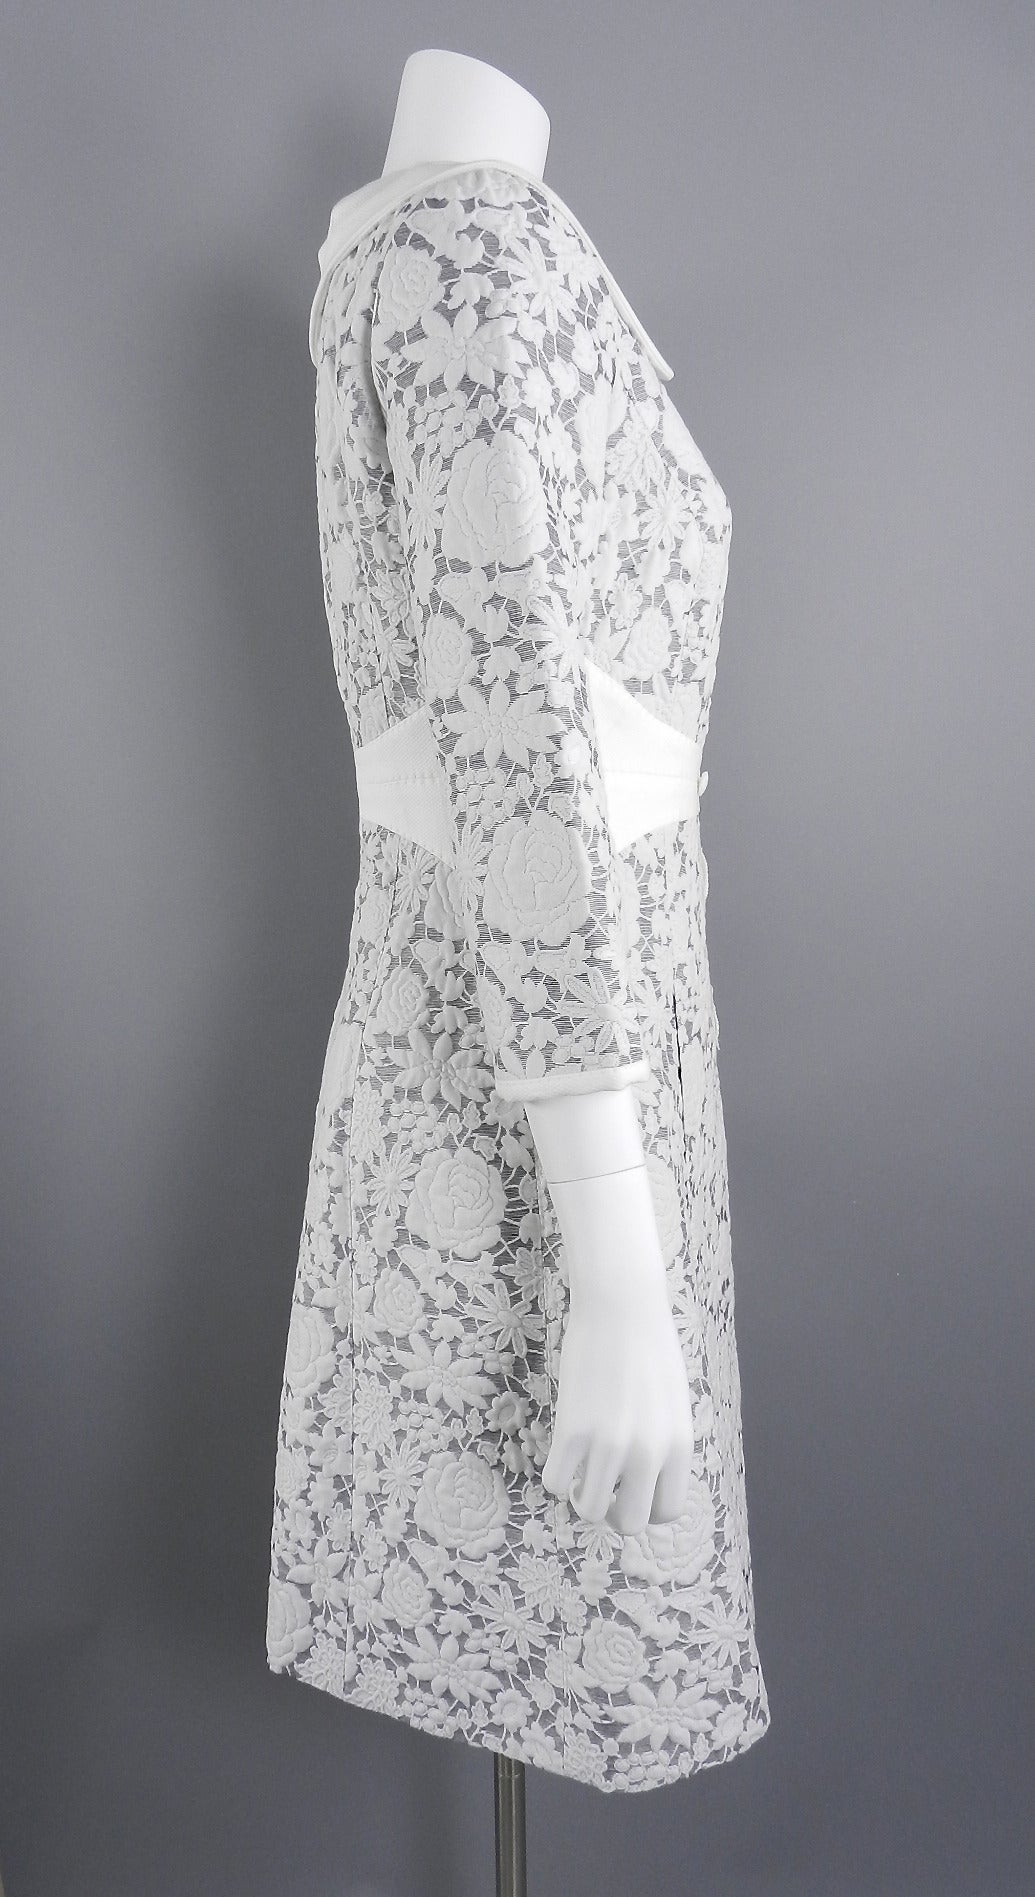 Louis Vuitton White Cotton Floral Jacket At 1stdibs